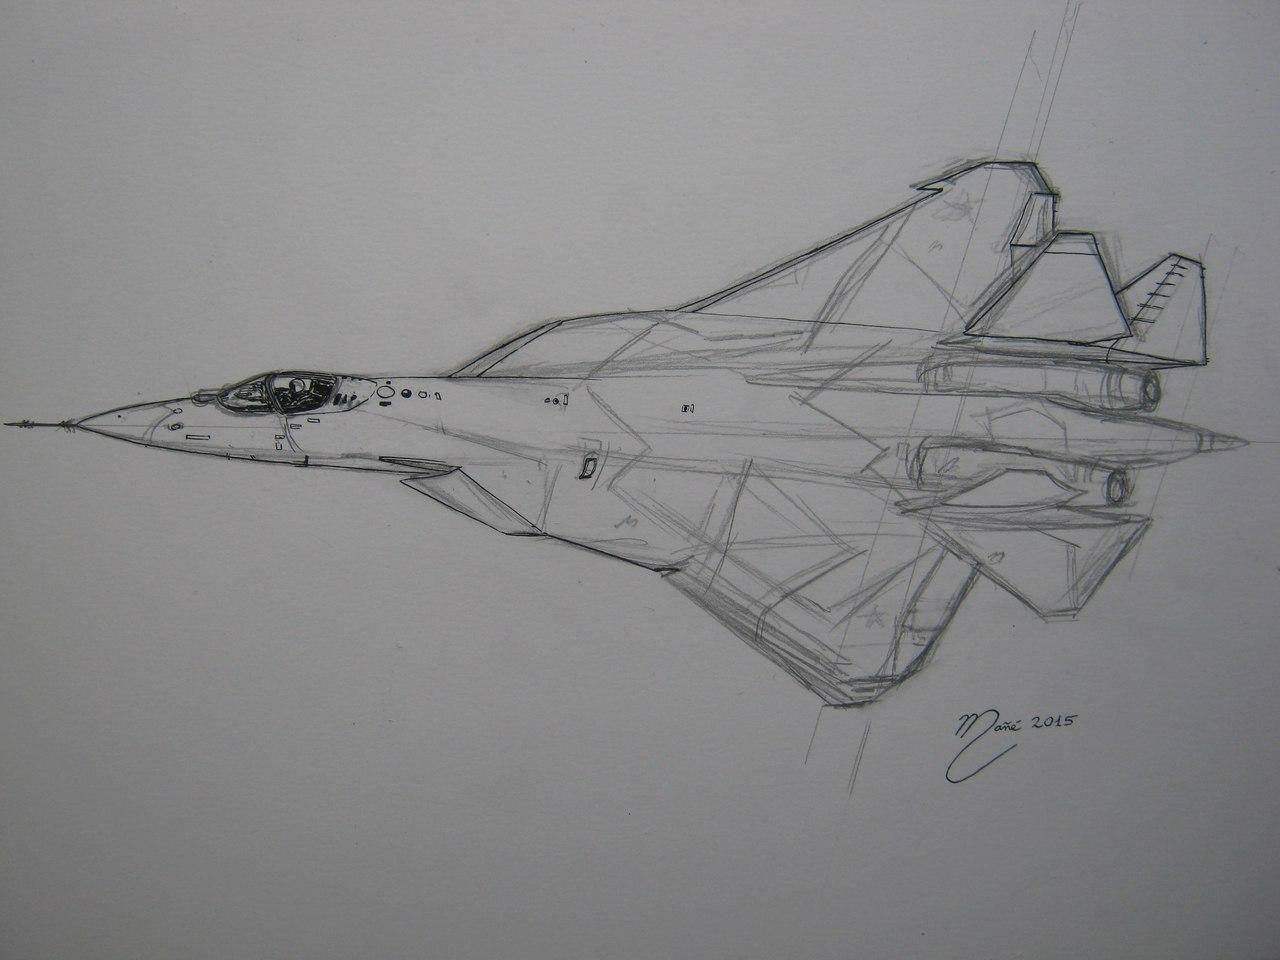 Истребитель Су 57 Т-50 (ПАК ФА). Рисунок карандашом Жоана Манье